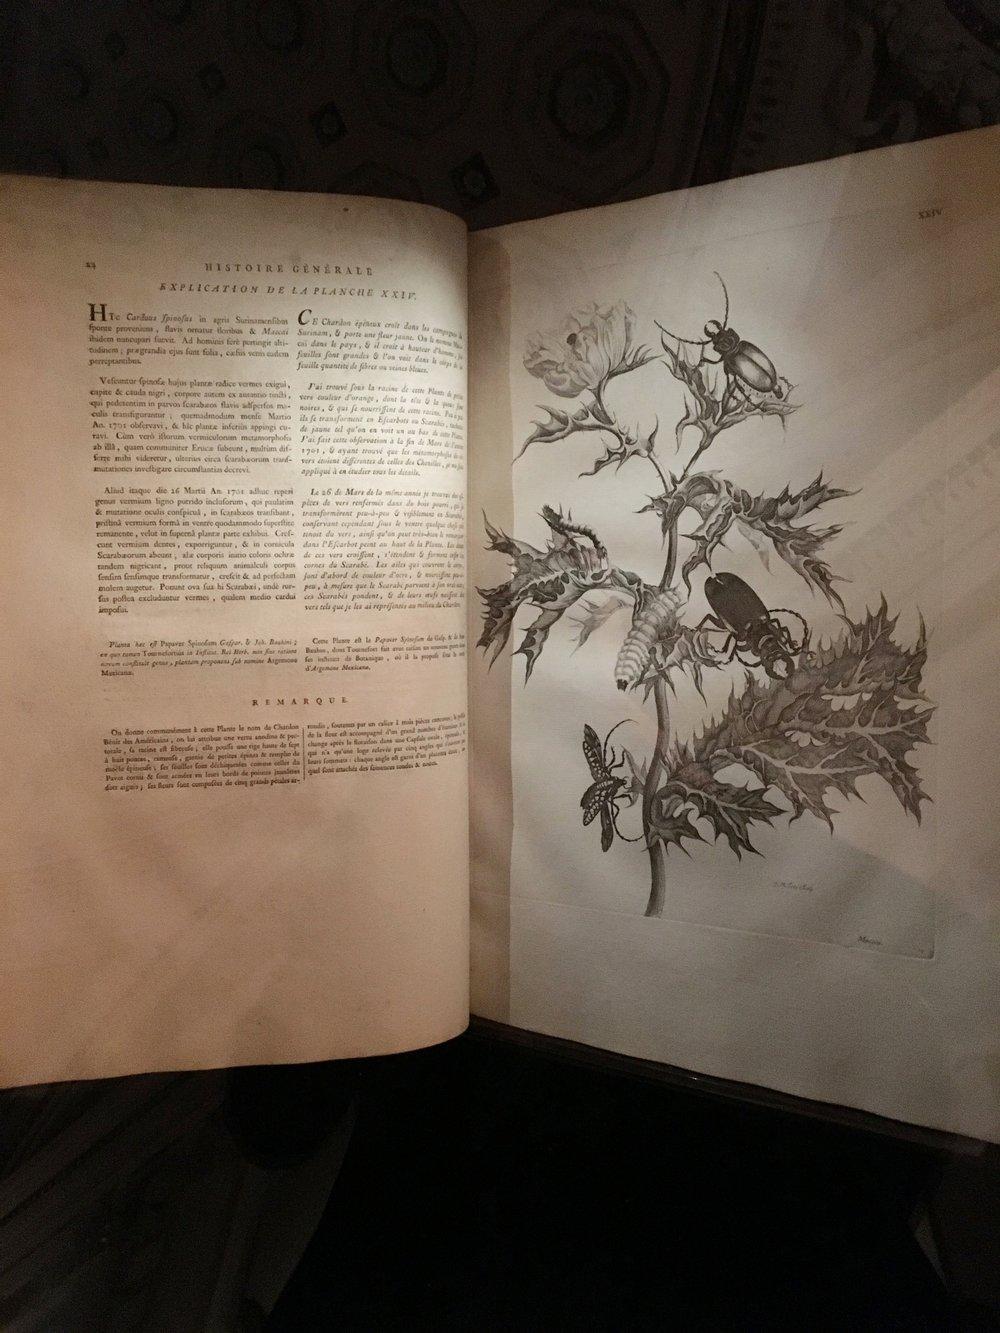 Book illustrations